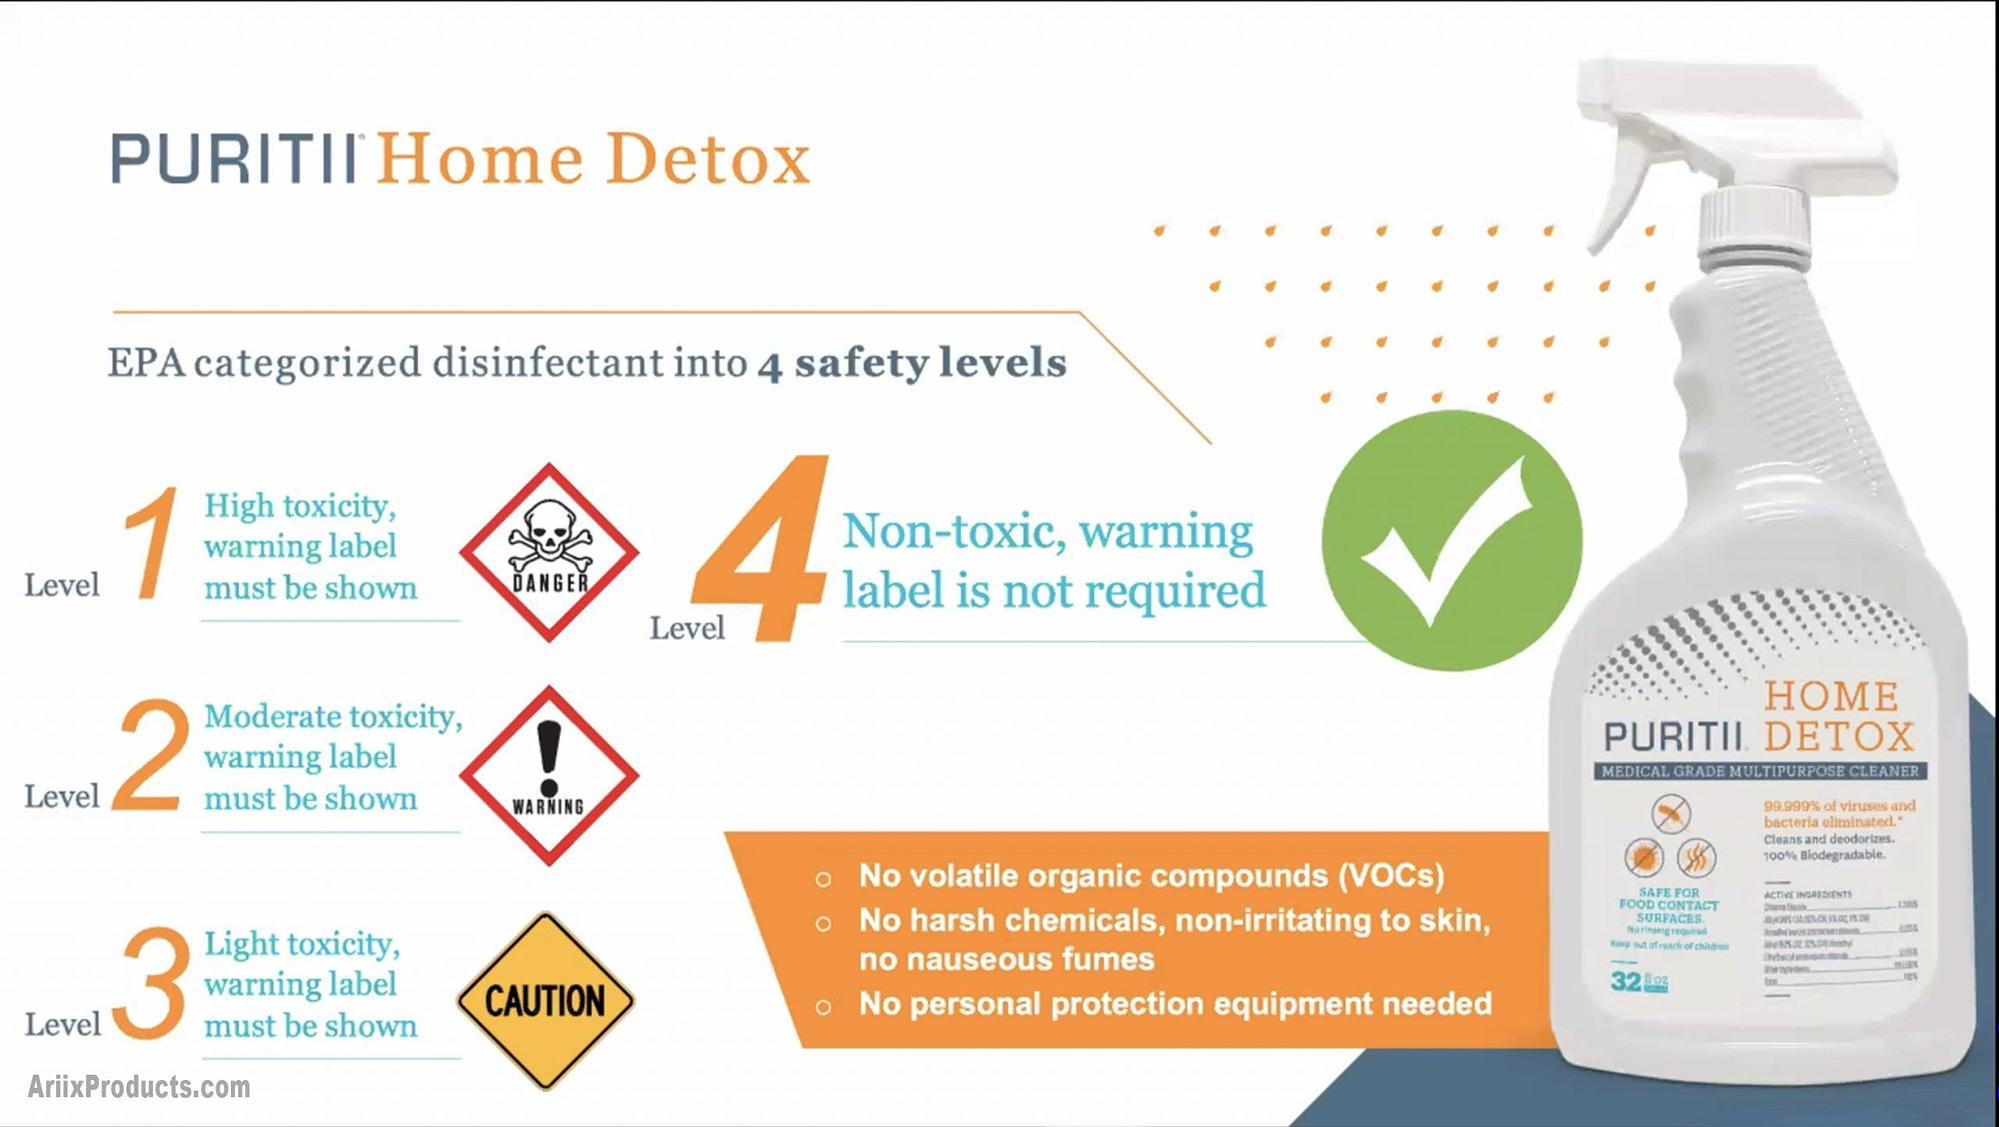 06 EPA Categorized Disinfectant